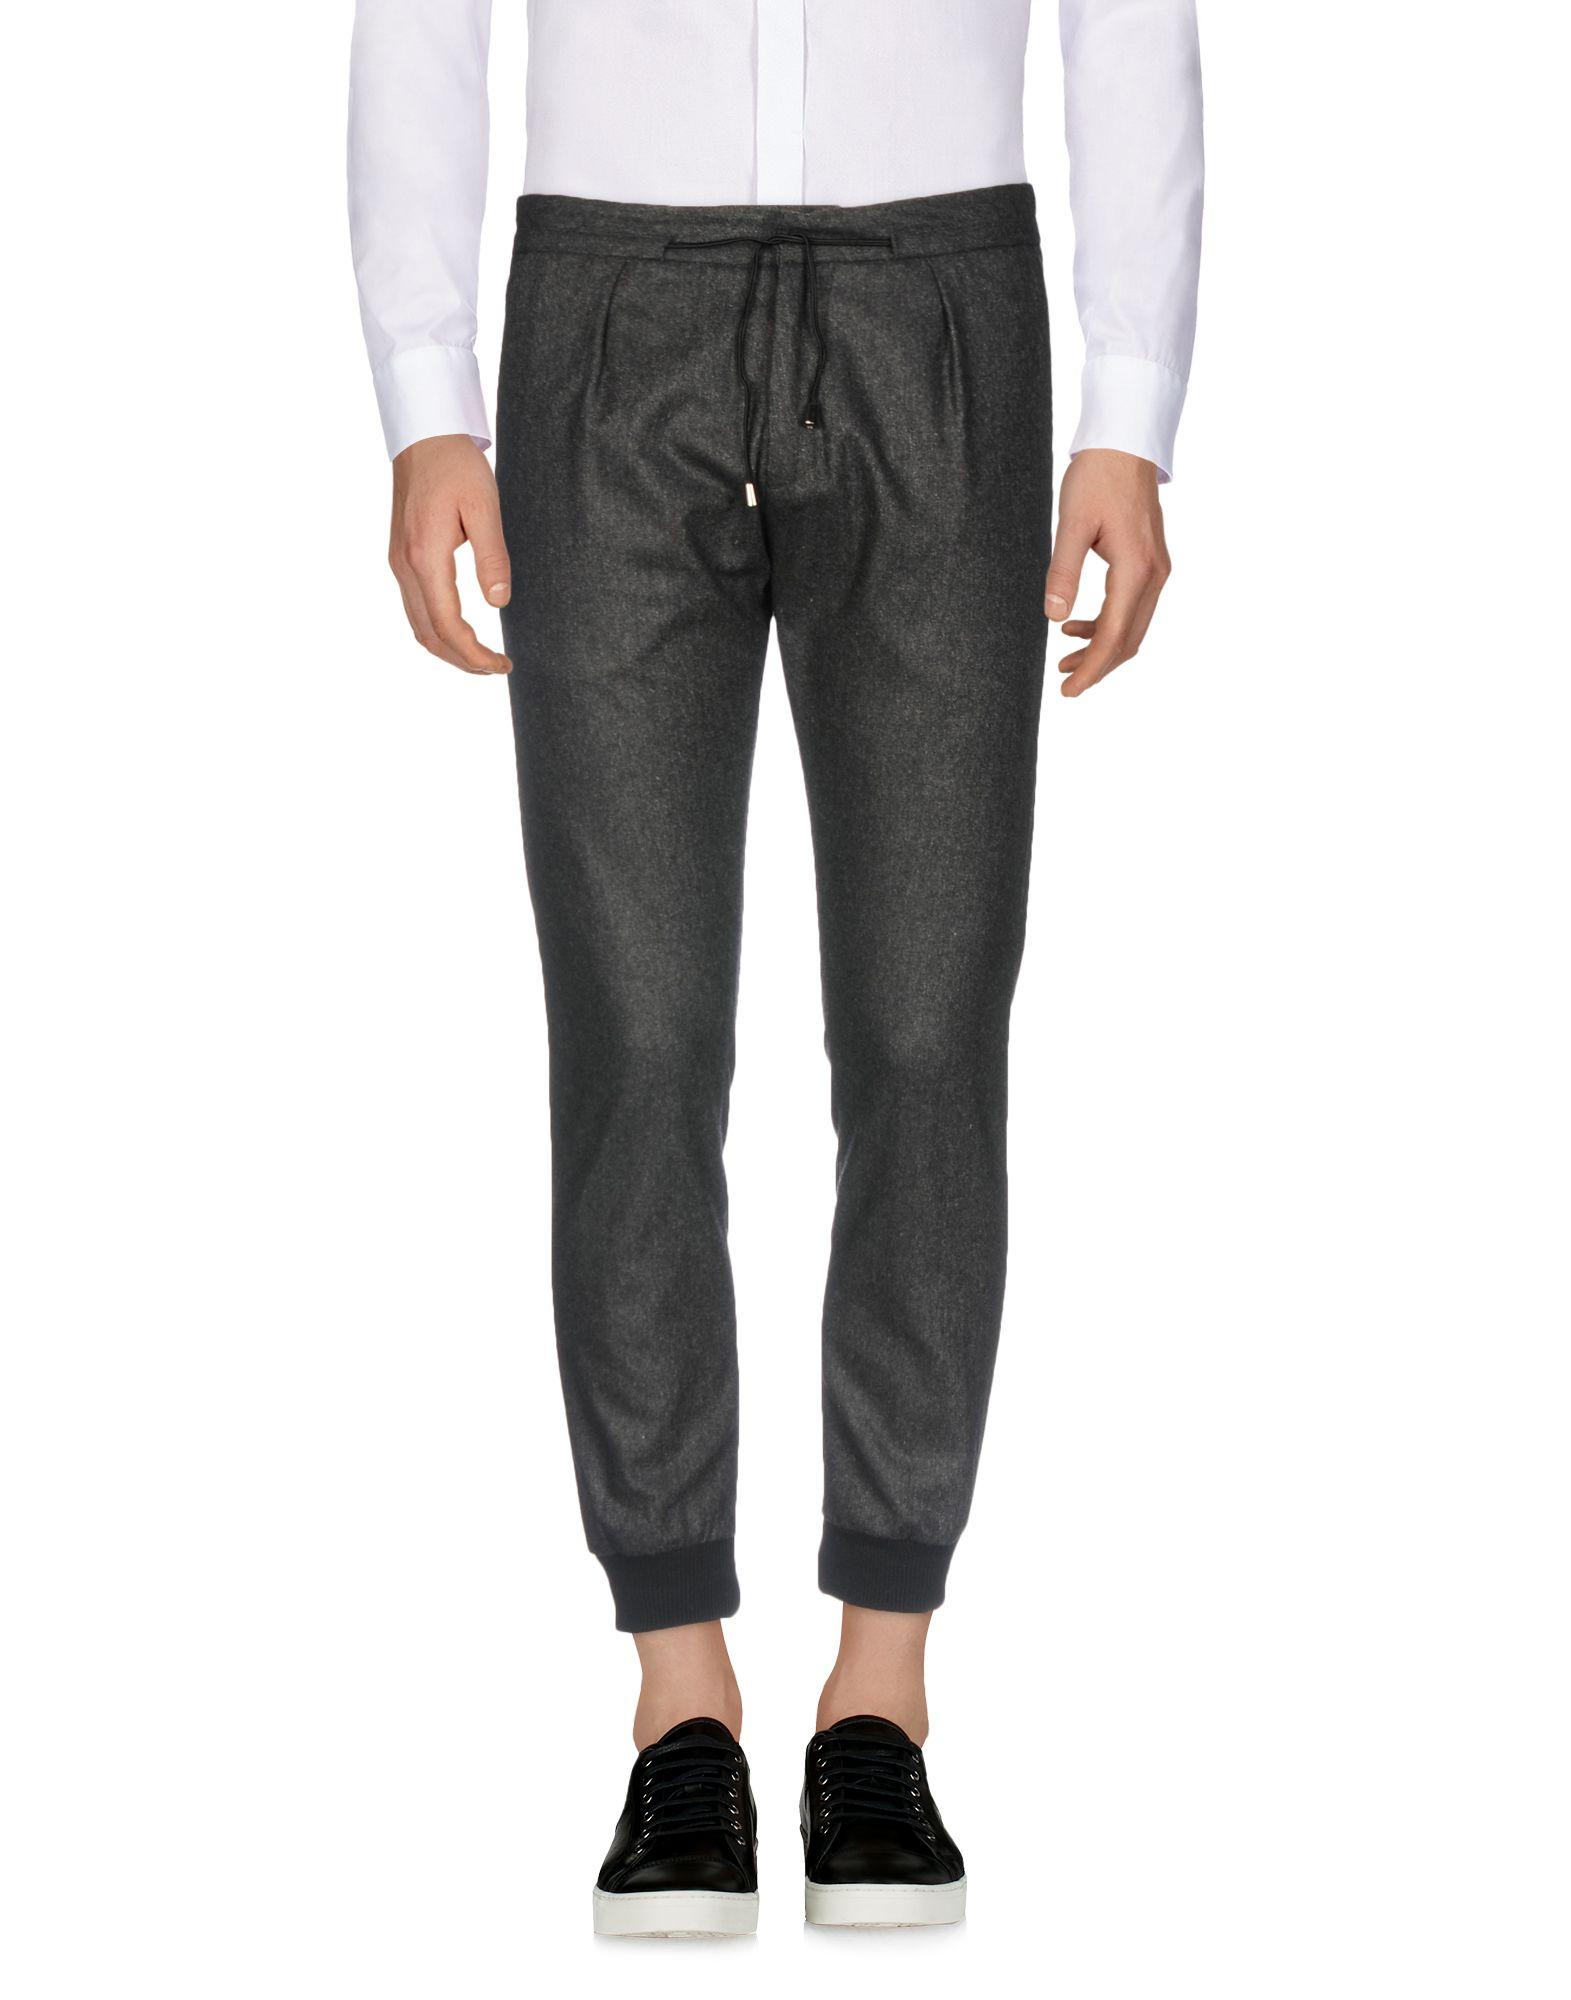 Pantalone Officina 36 Donna - Acquista online su